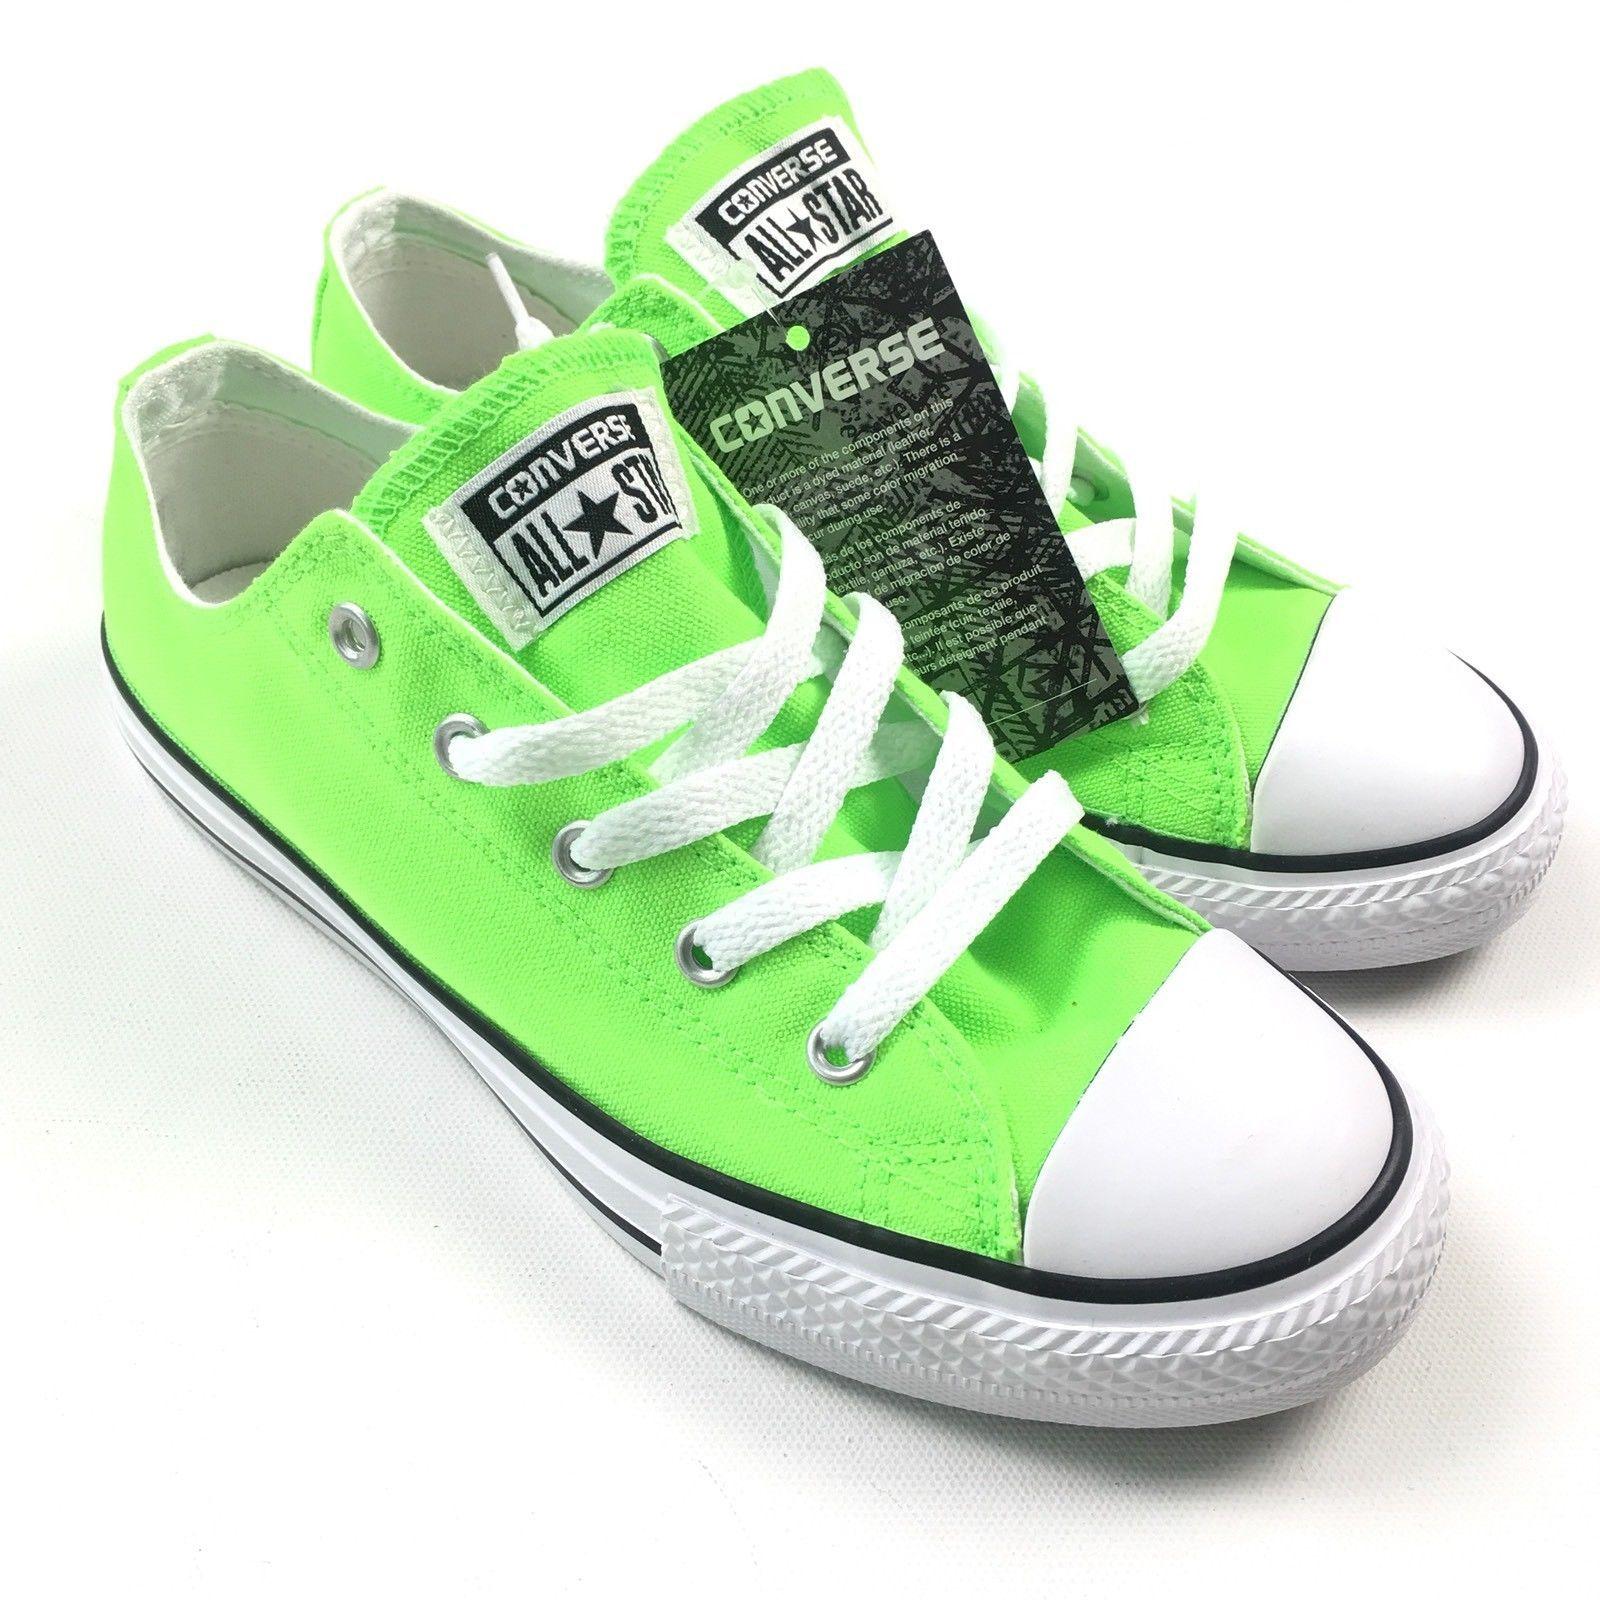 073ecb4df7d2e6 Converse Womens Chuck Taylor OX Green Gecko White Sneakers Size 5 NEW  35 A4